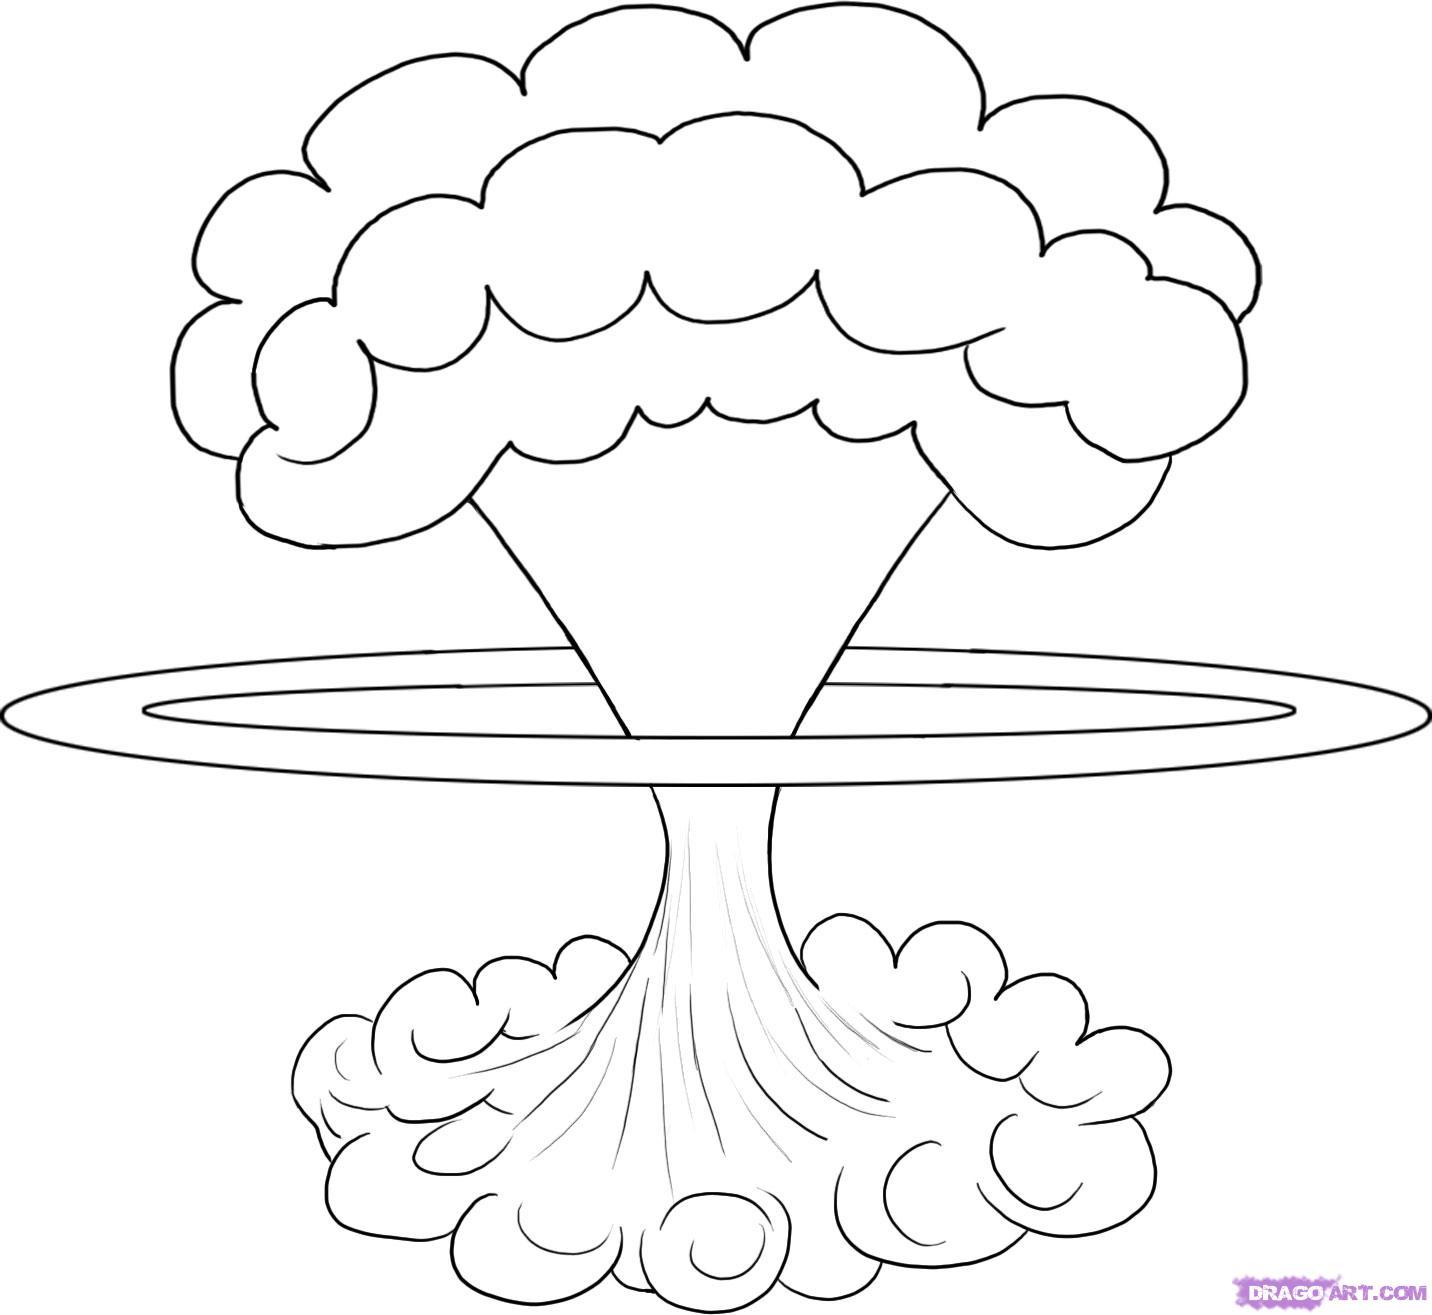 1432x1315 Mushroom Cloud Drawing How To Draw A Mushroom Cloud, Stepstep